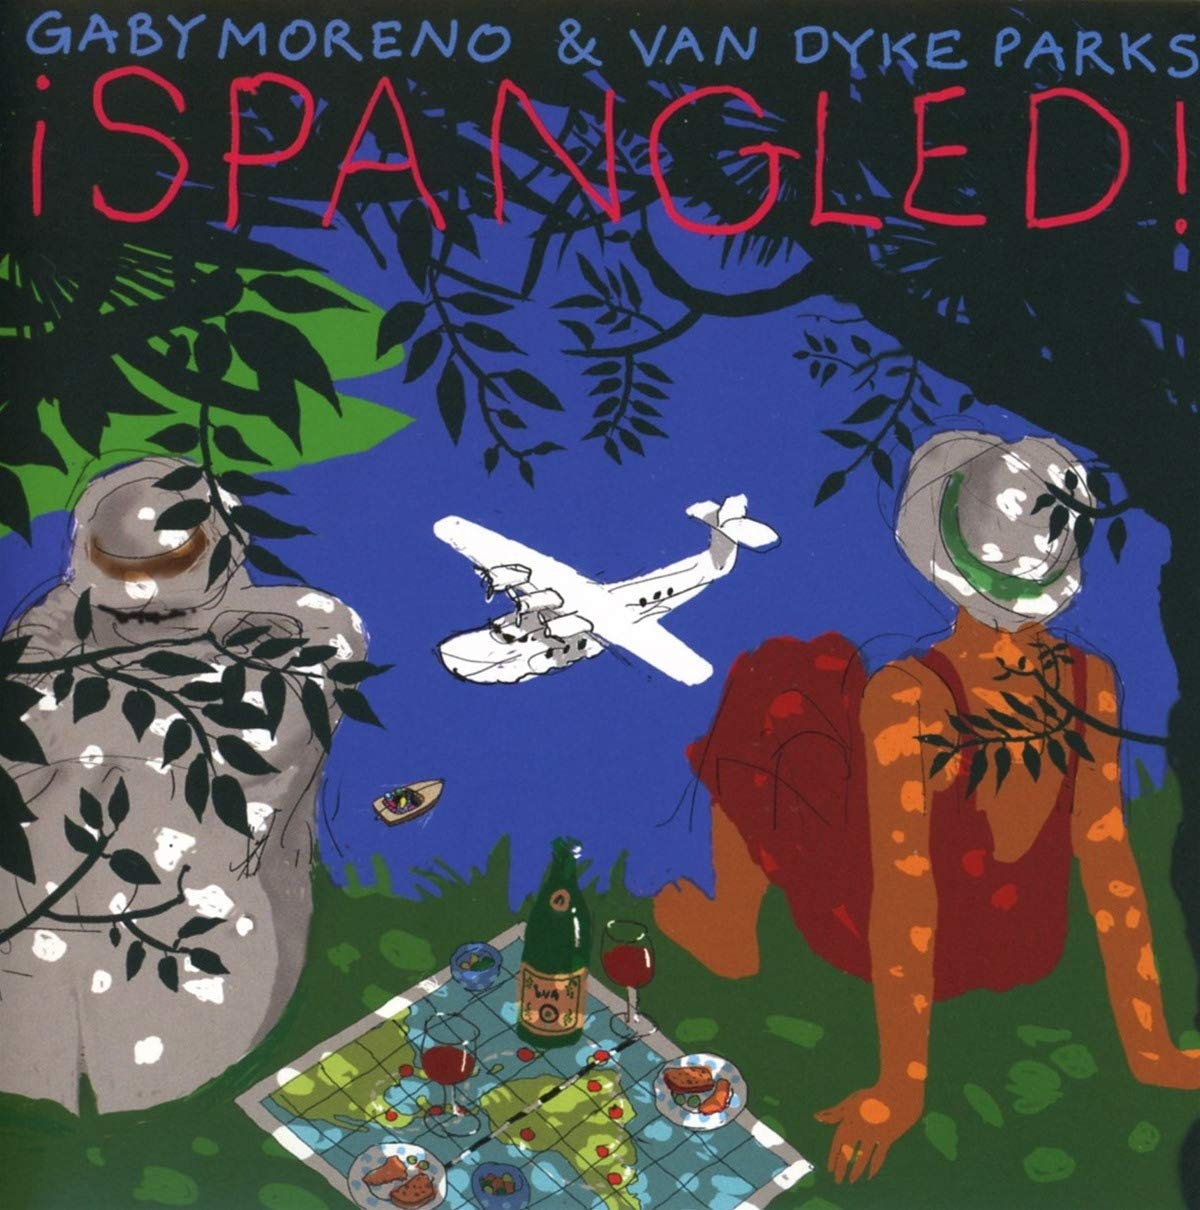 Gaby Moreno & Van Dyke Parks - ¡Spangled ! (CD )